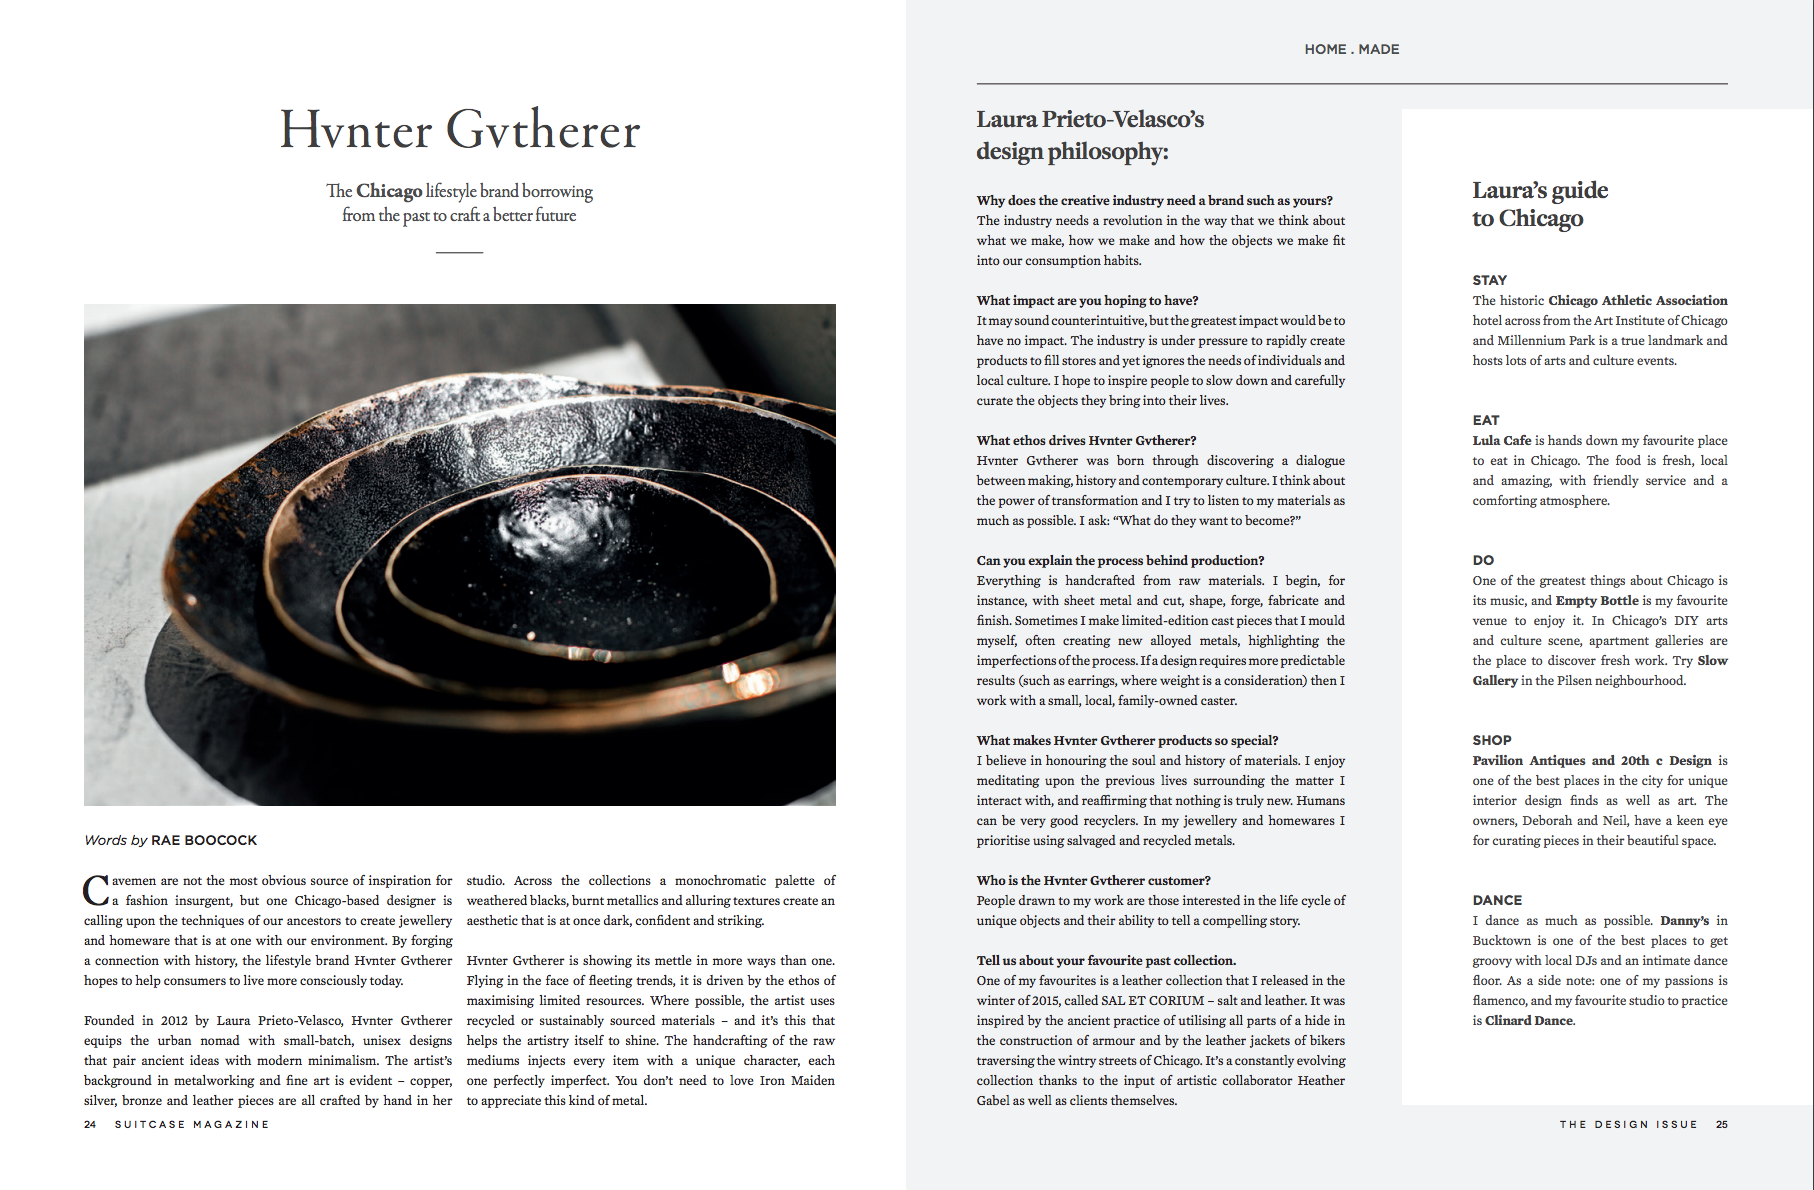 SUITCASE magazine - Vol 22 - Design Issue - Hvnter Gvtherer